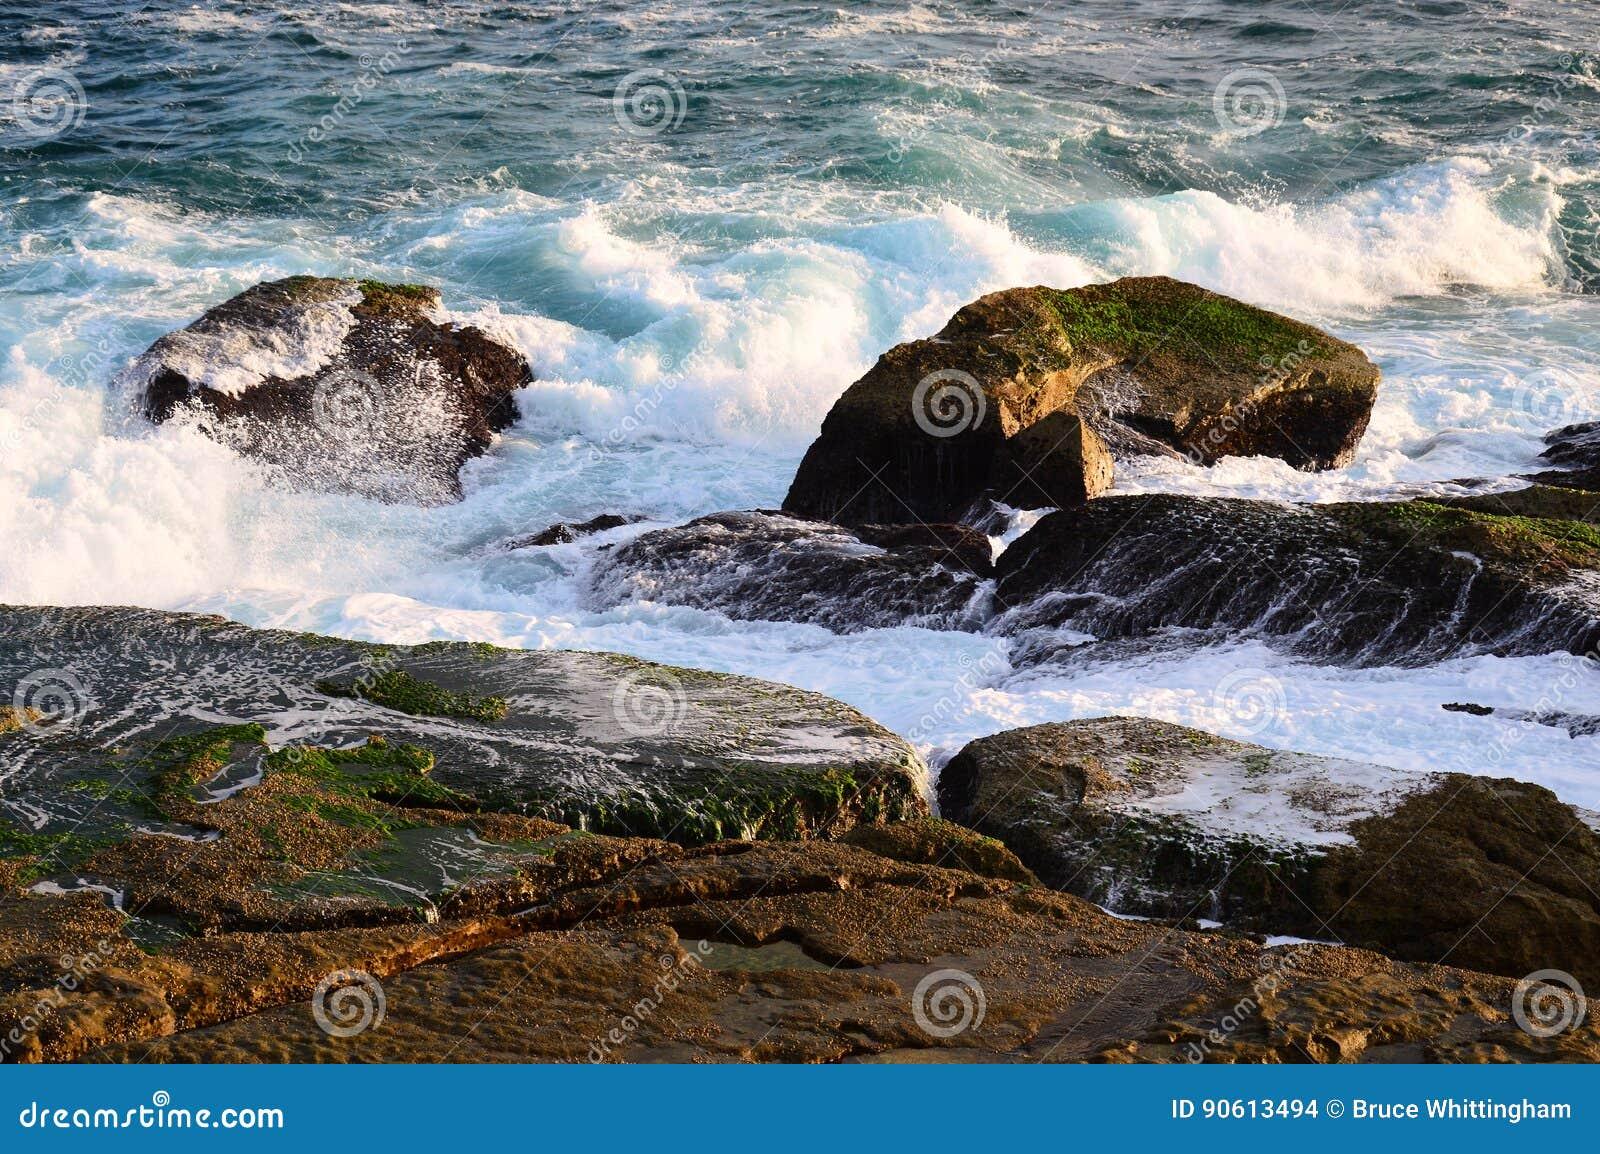 Vreedzame Oceaangolven op Rotsen